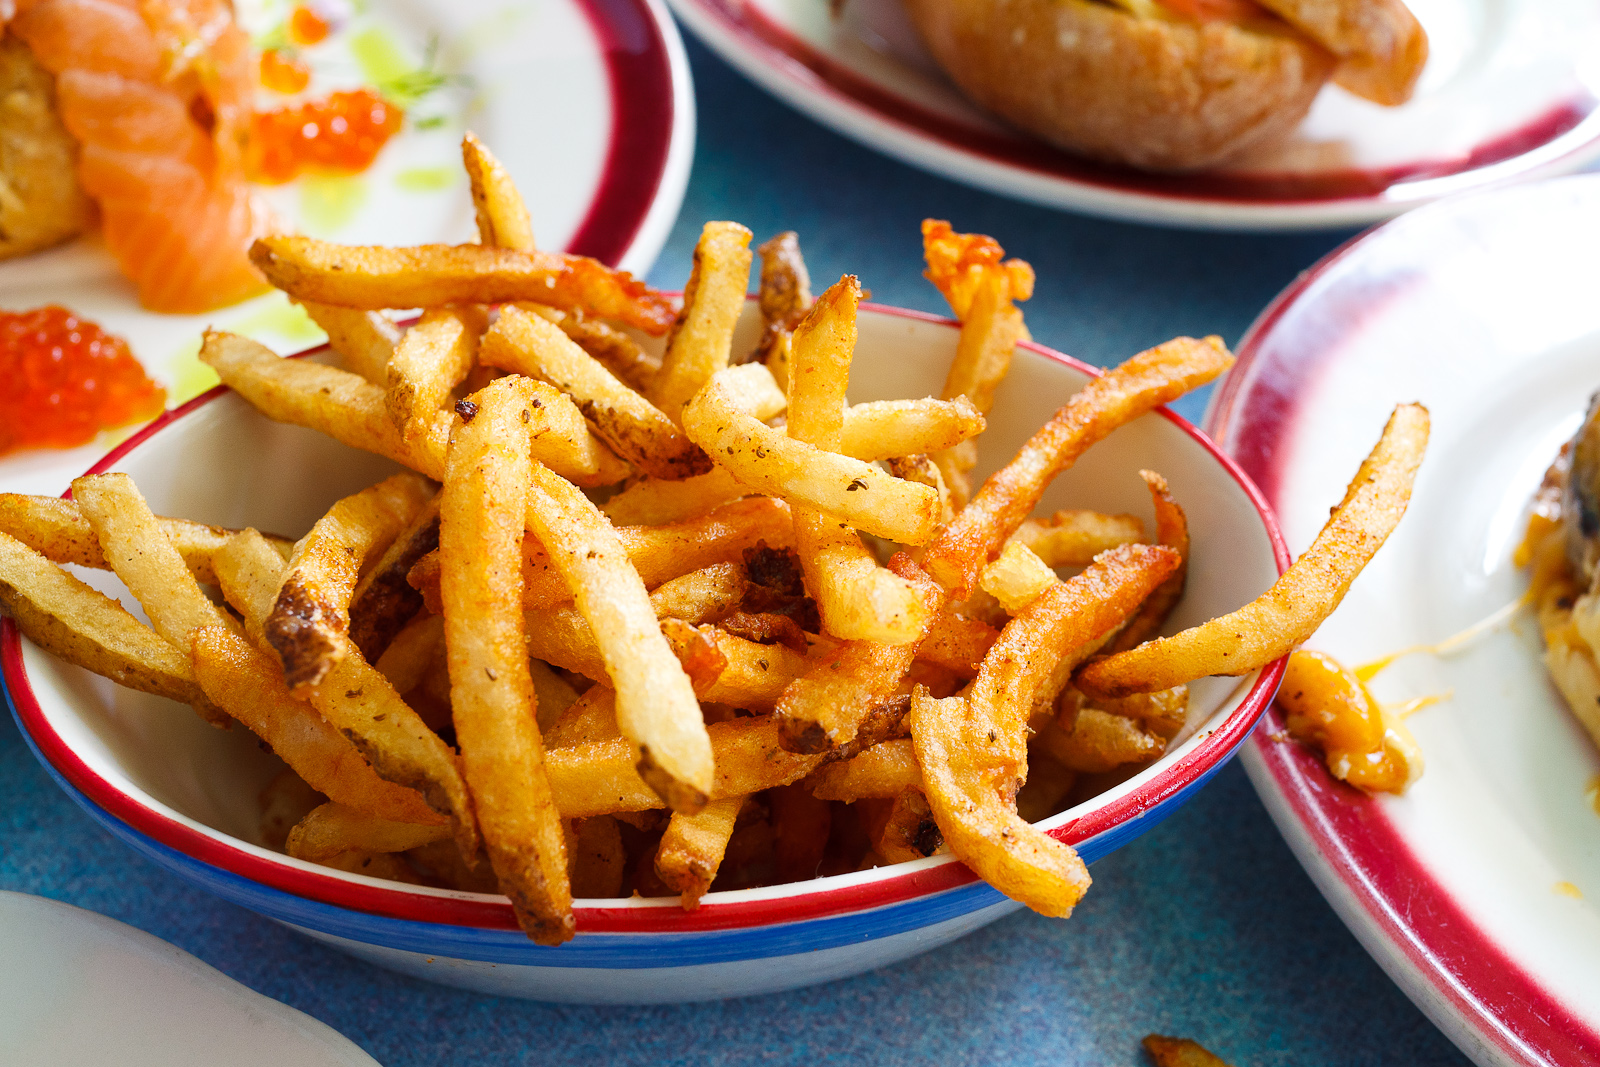 Hand-cut Fries ($3)